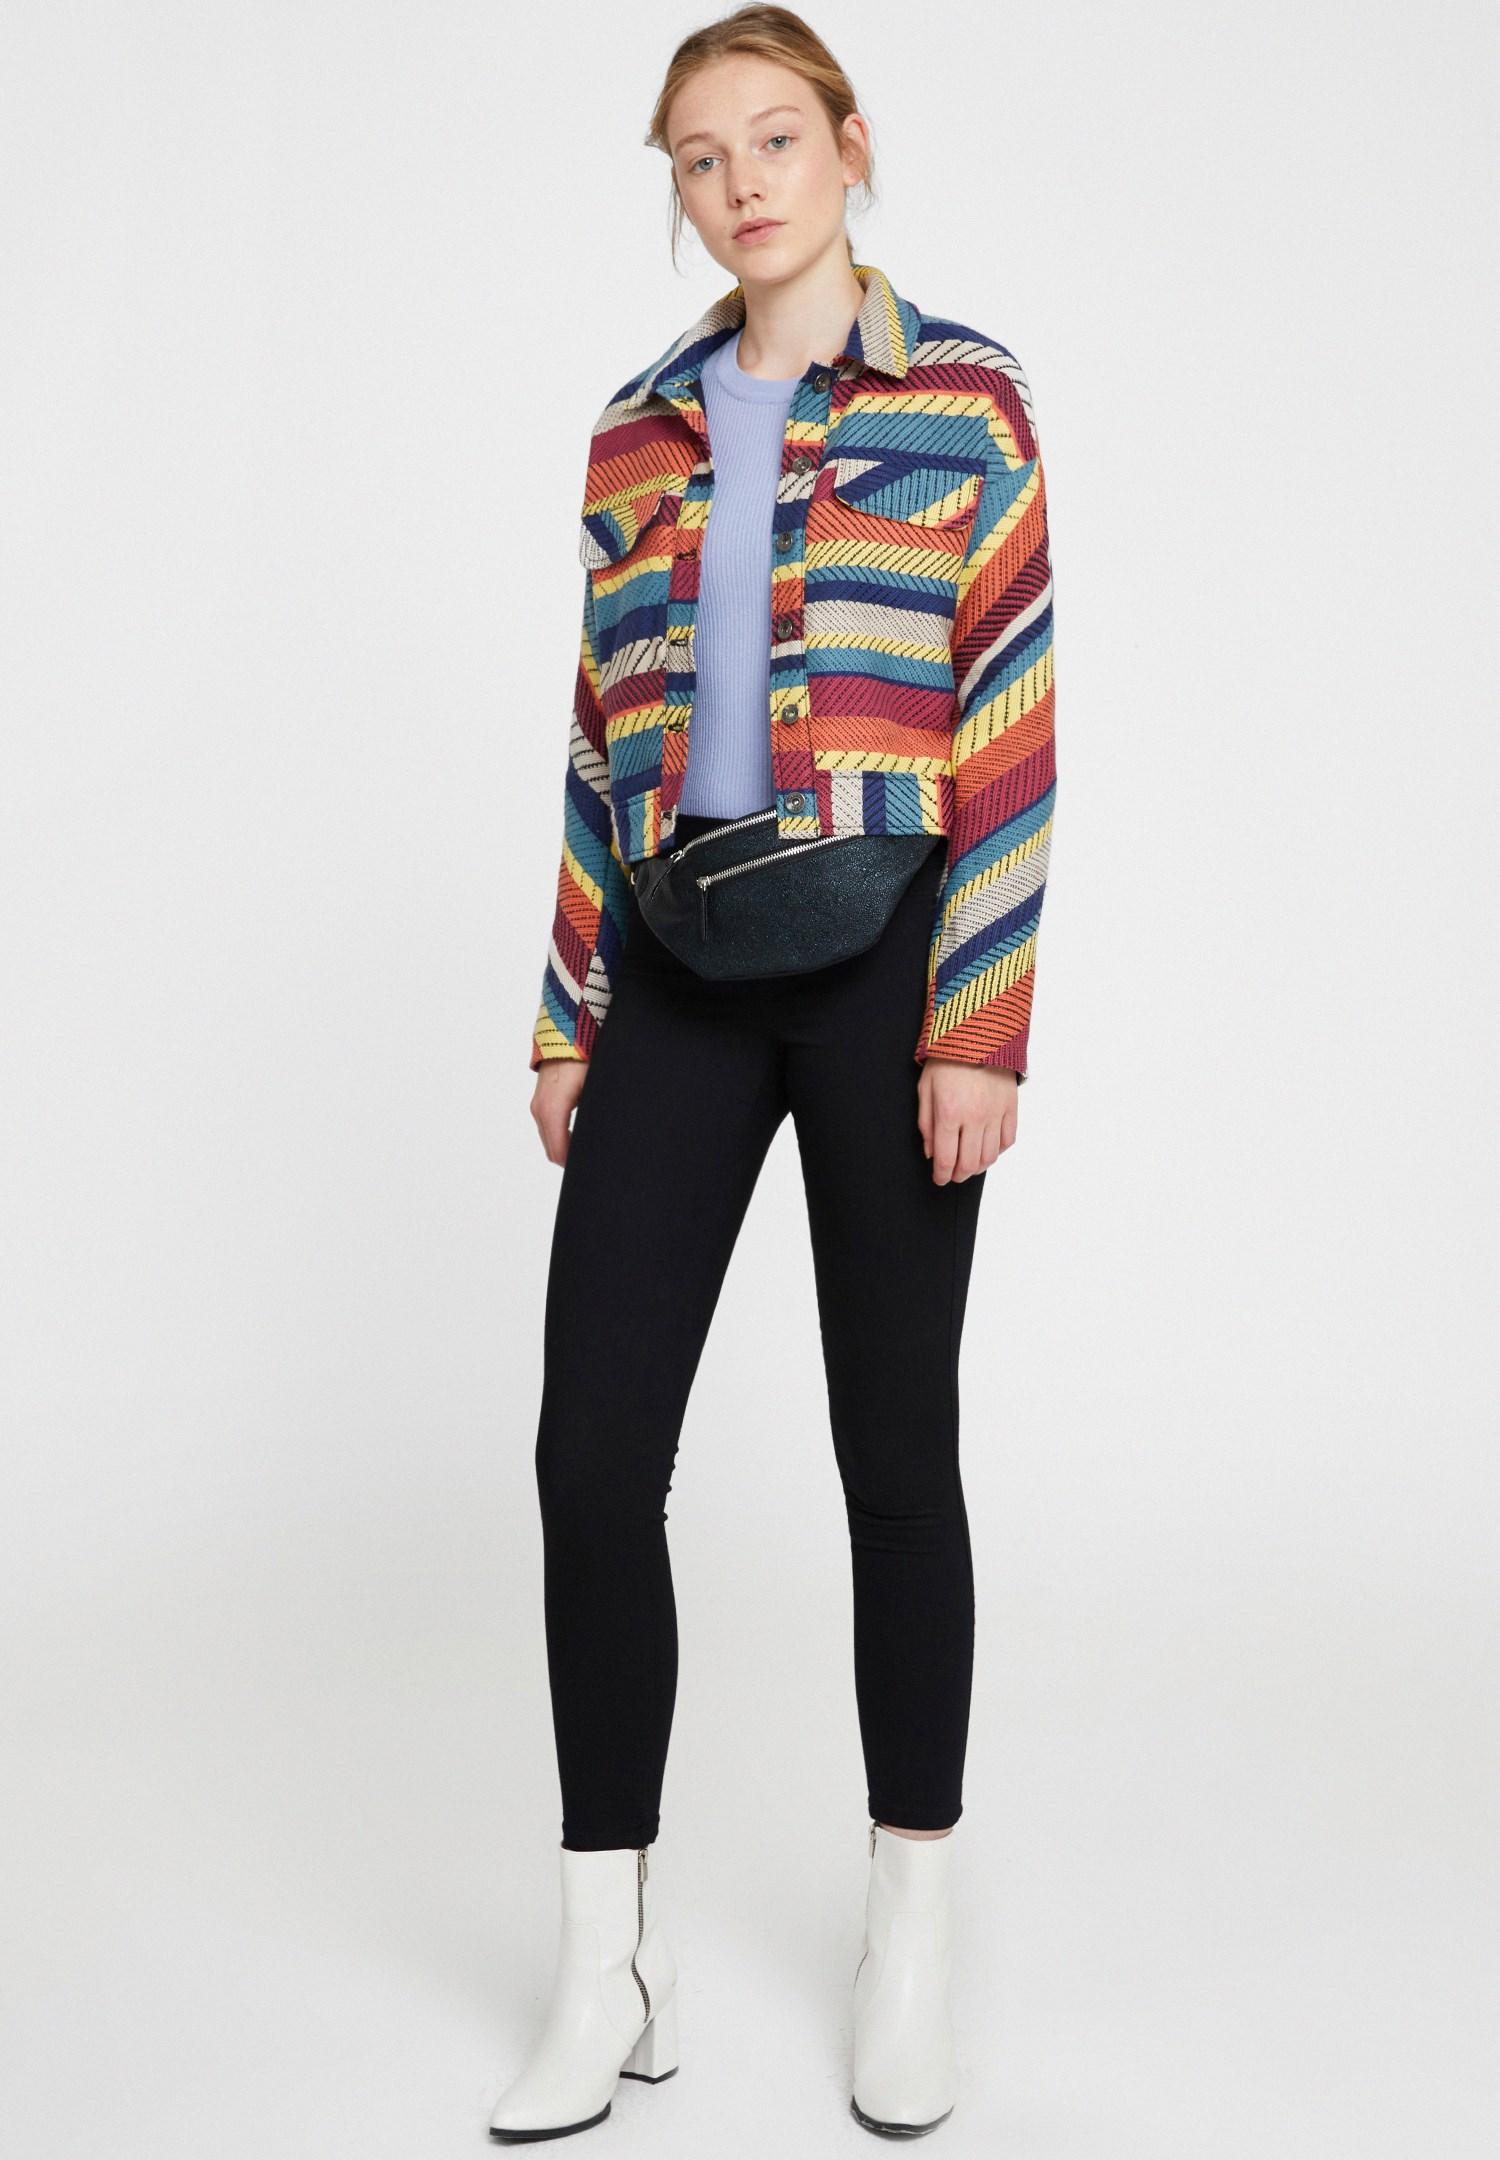 Bayan Siyah Orta Bel Arka Cep Detaylı Tayt Pantolon